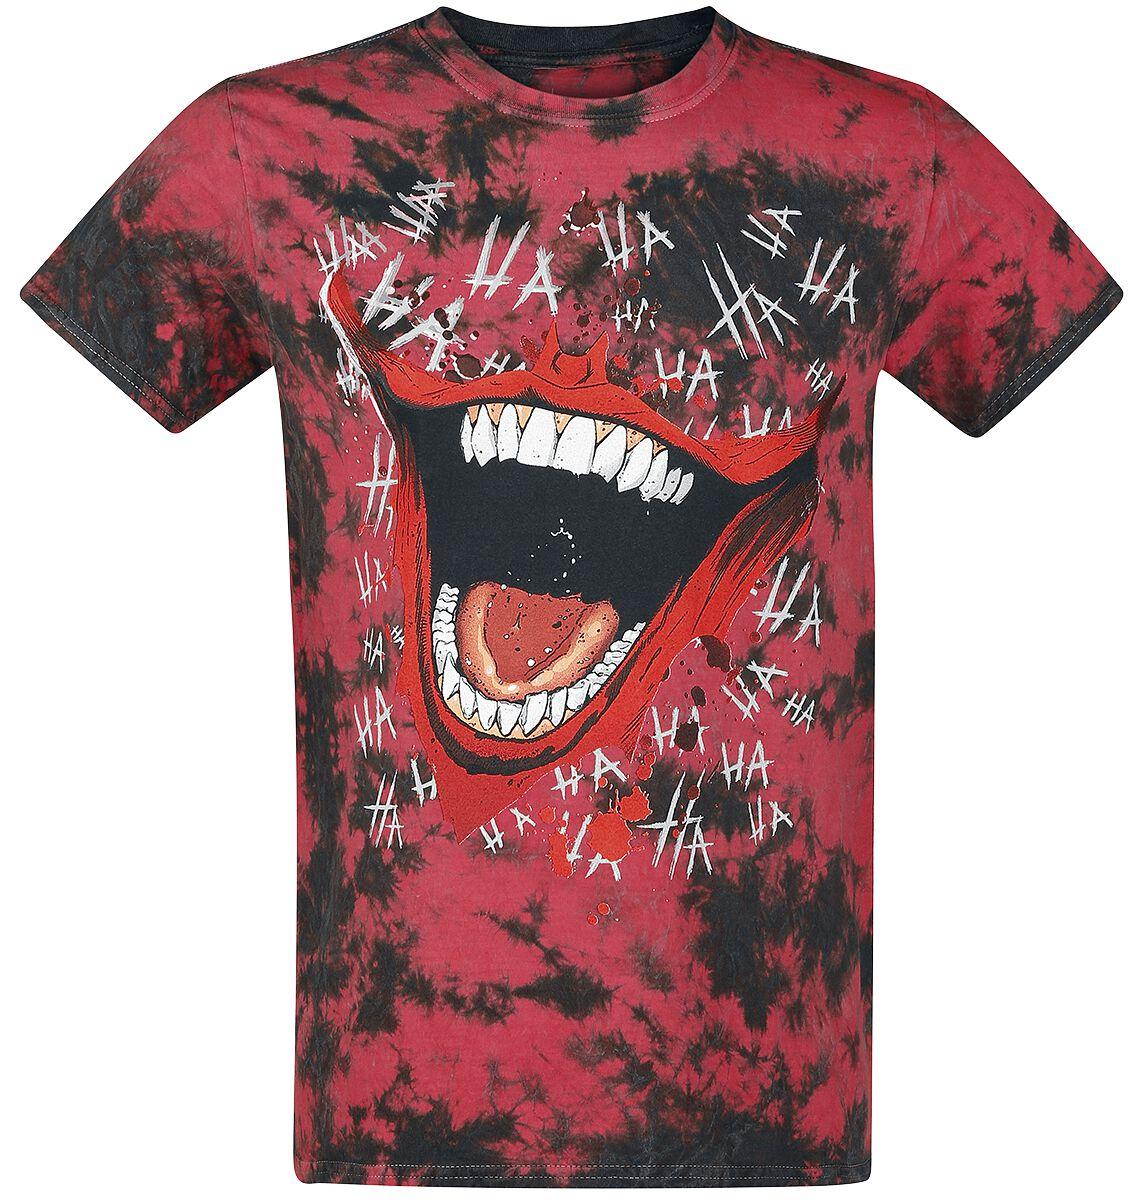 Merch dla Fanów - Koszulki - T-Shirt The Joker Hahaha T-Shirt wielokolorowy - 361335